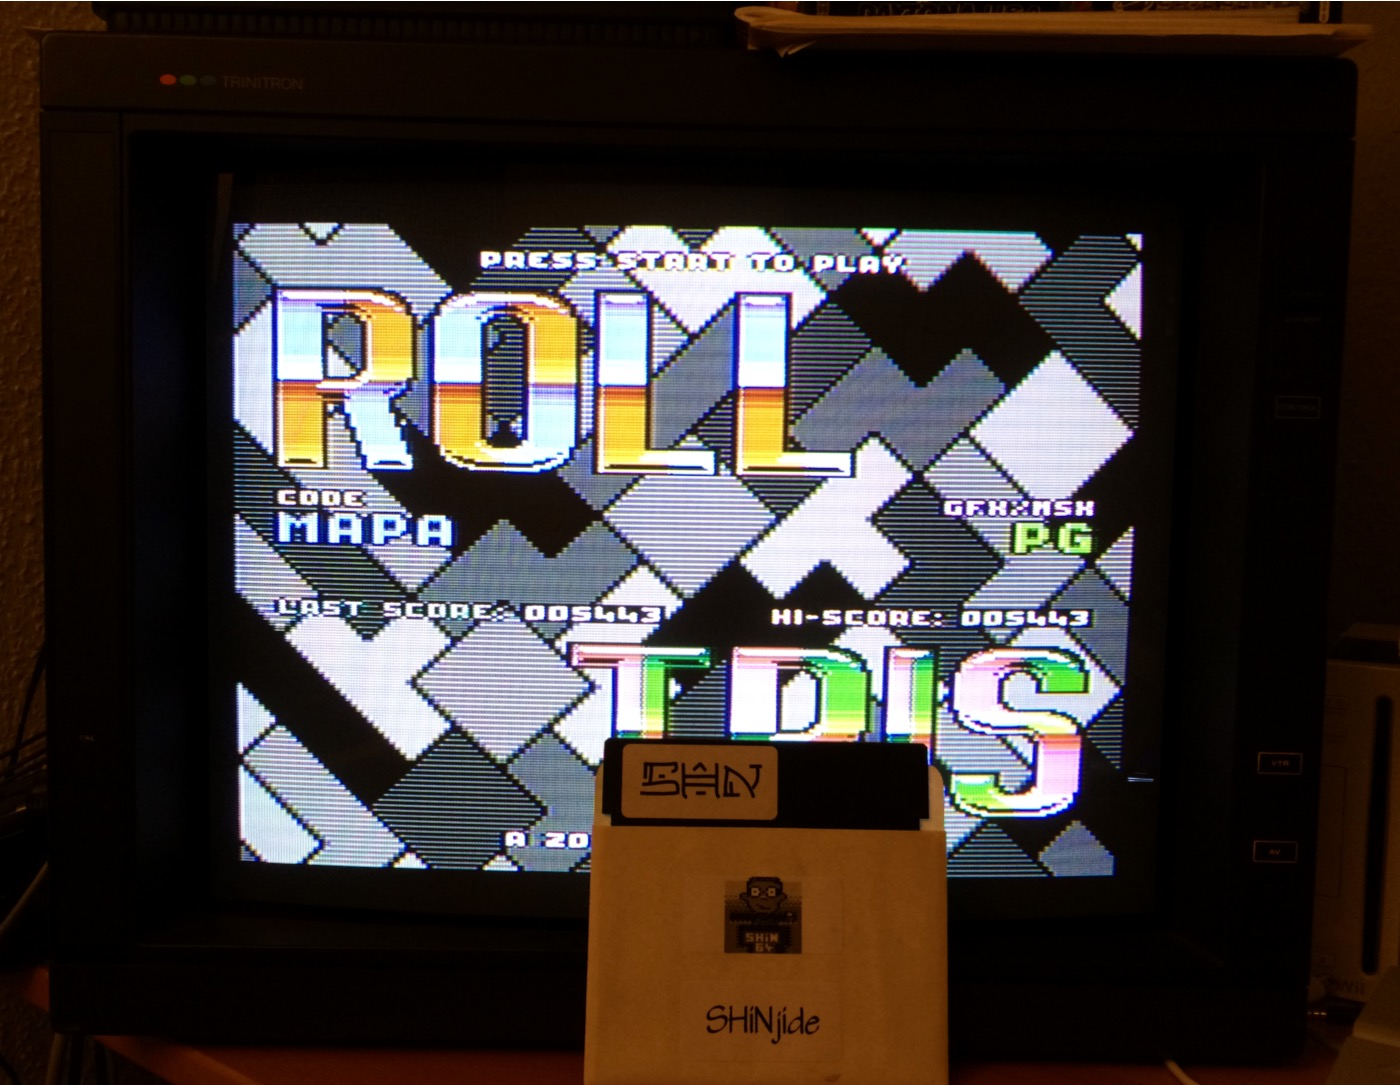 SHiNjide: Rolltris (Atari 400/800/XL/XE) 5,443 points on 2015-01-16 16:55:20